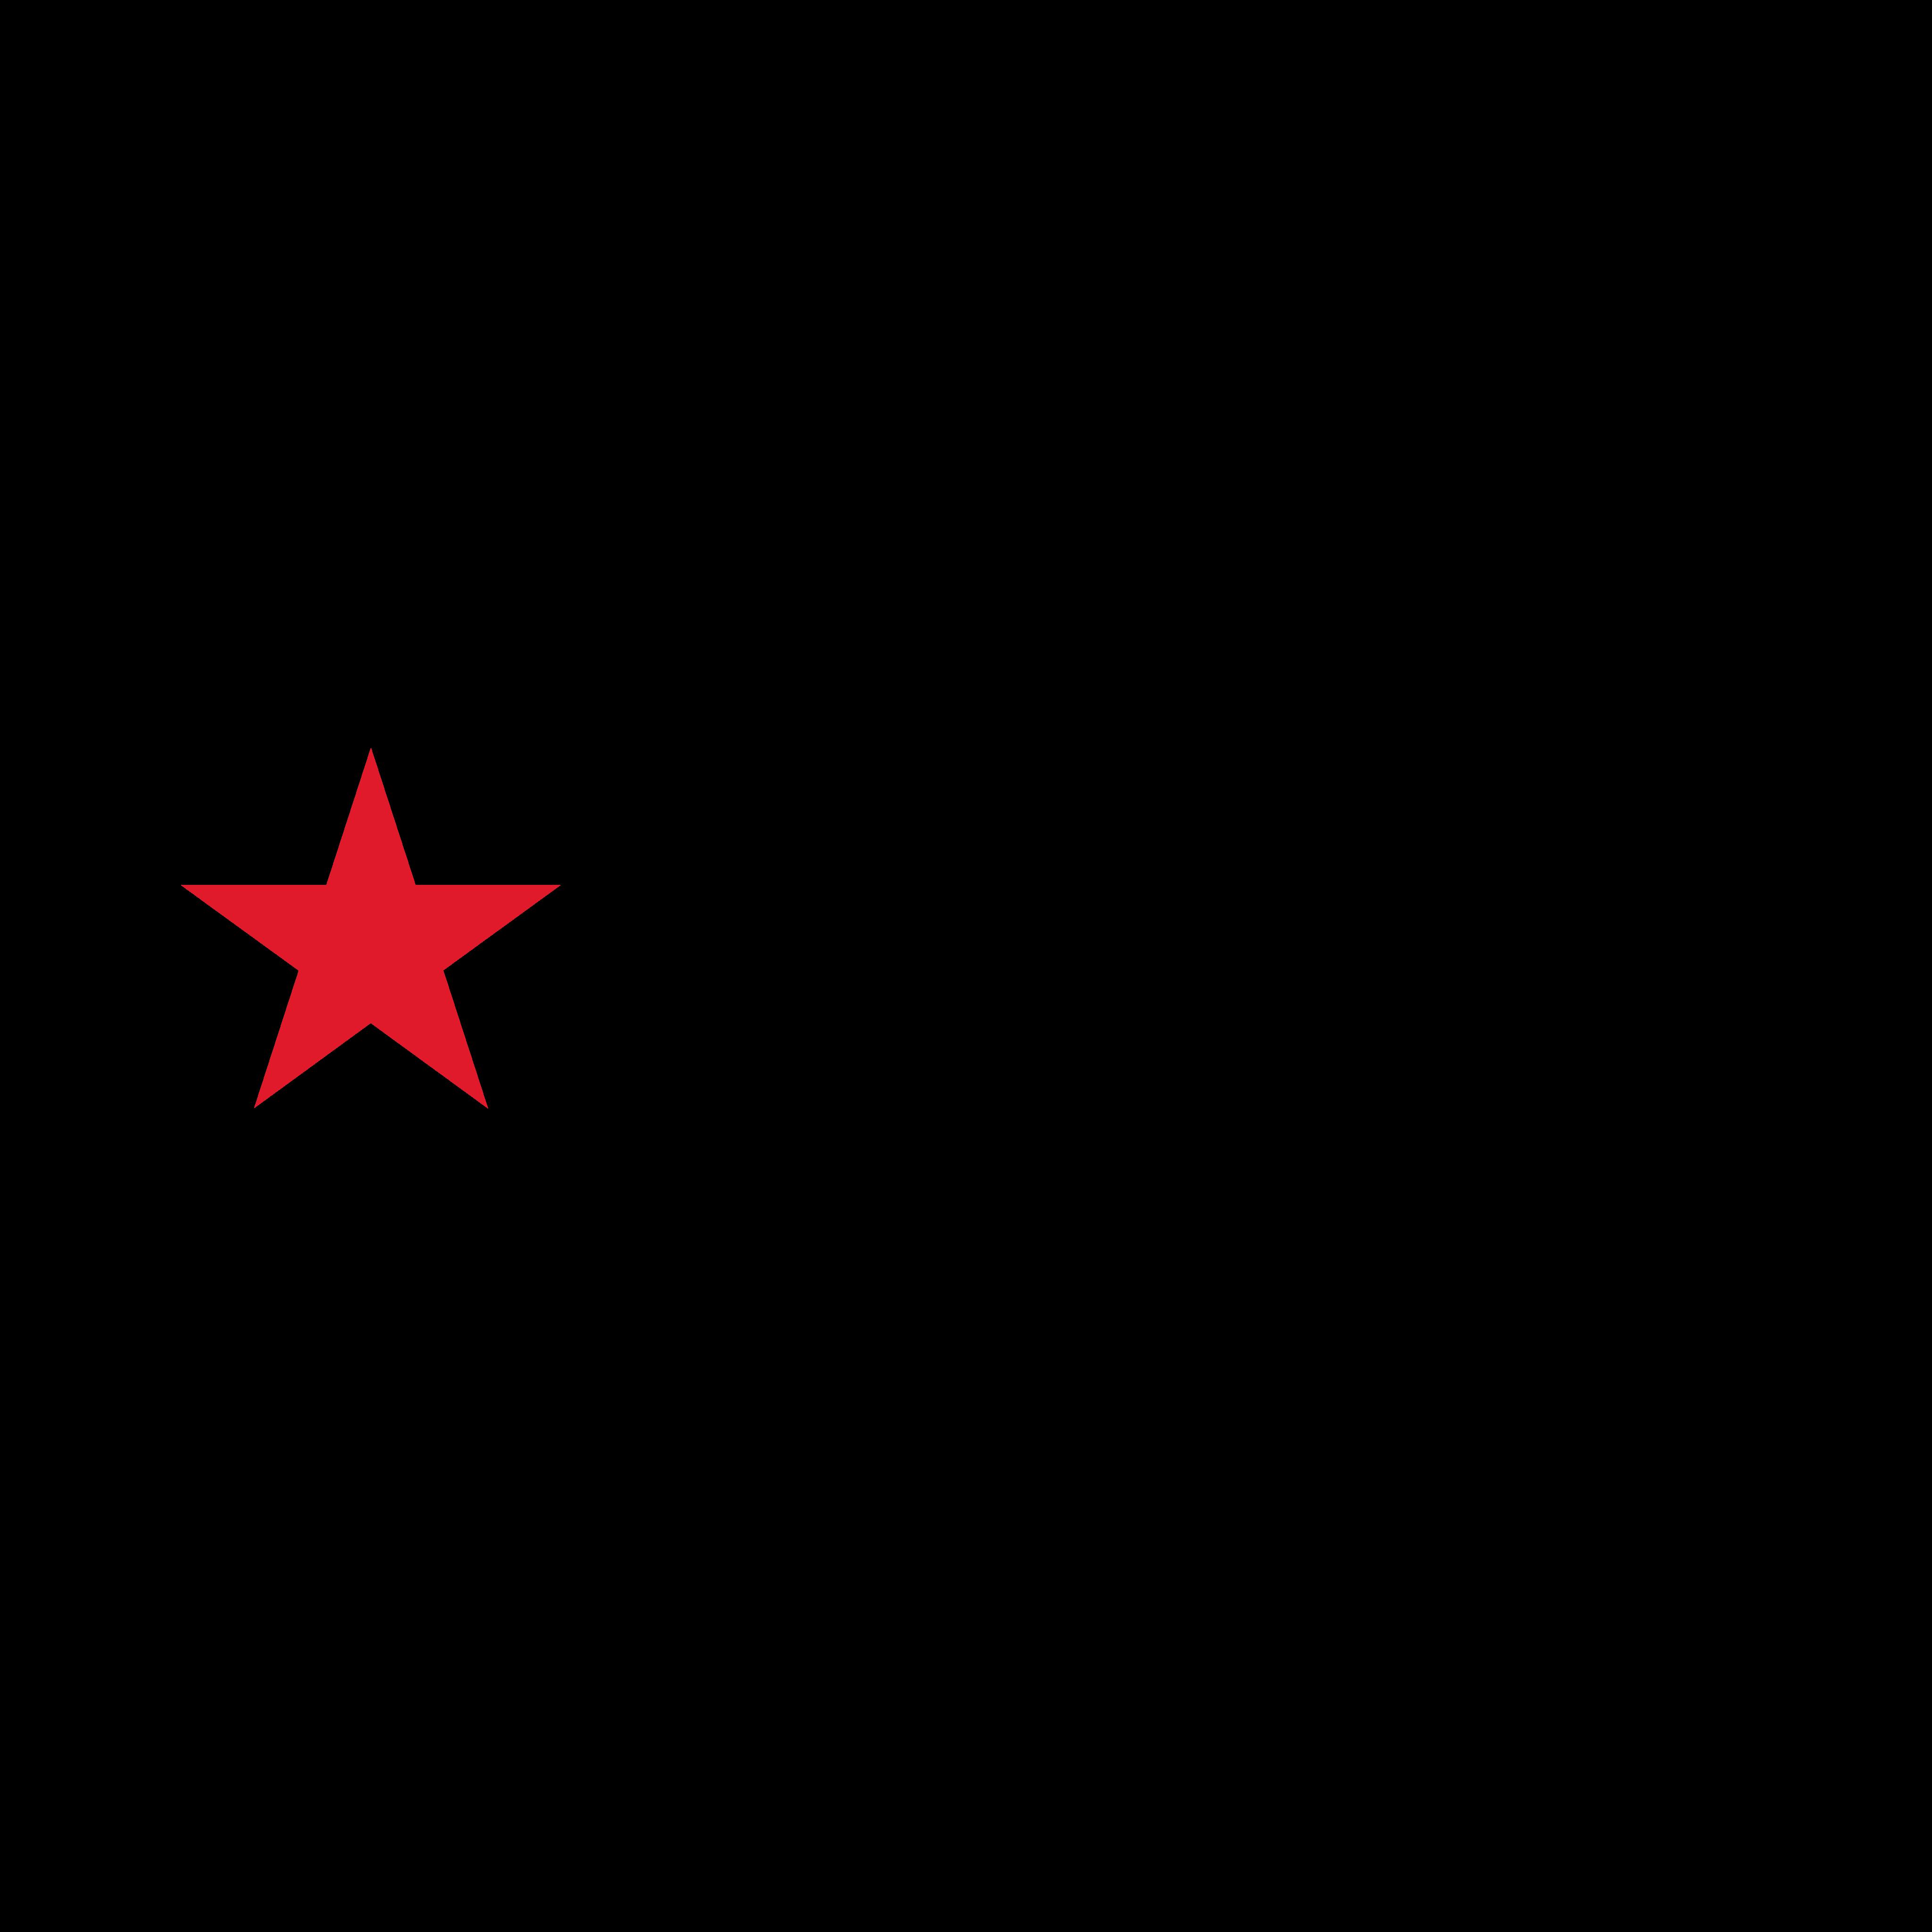 macys logo 0 - Macy's Logo